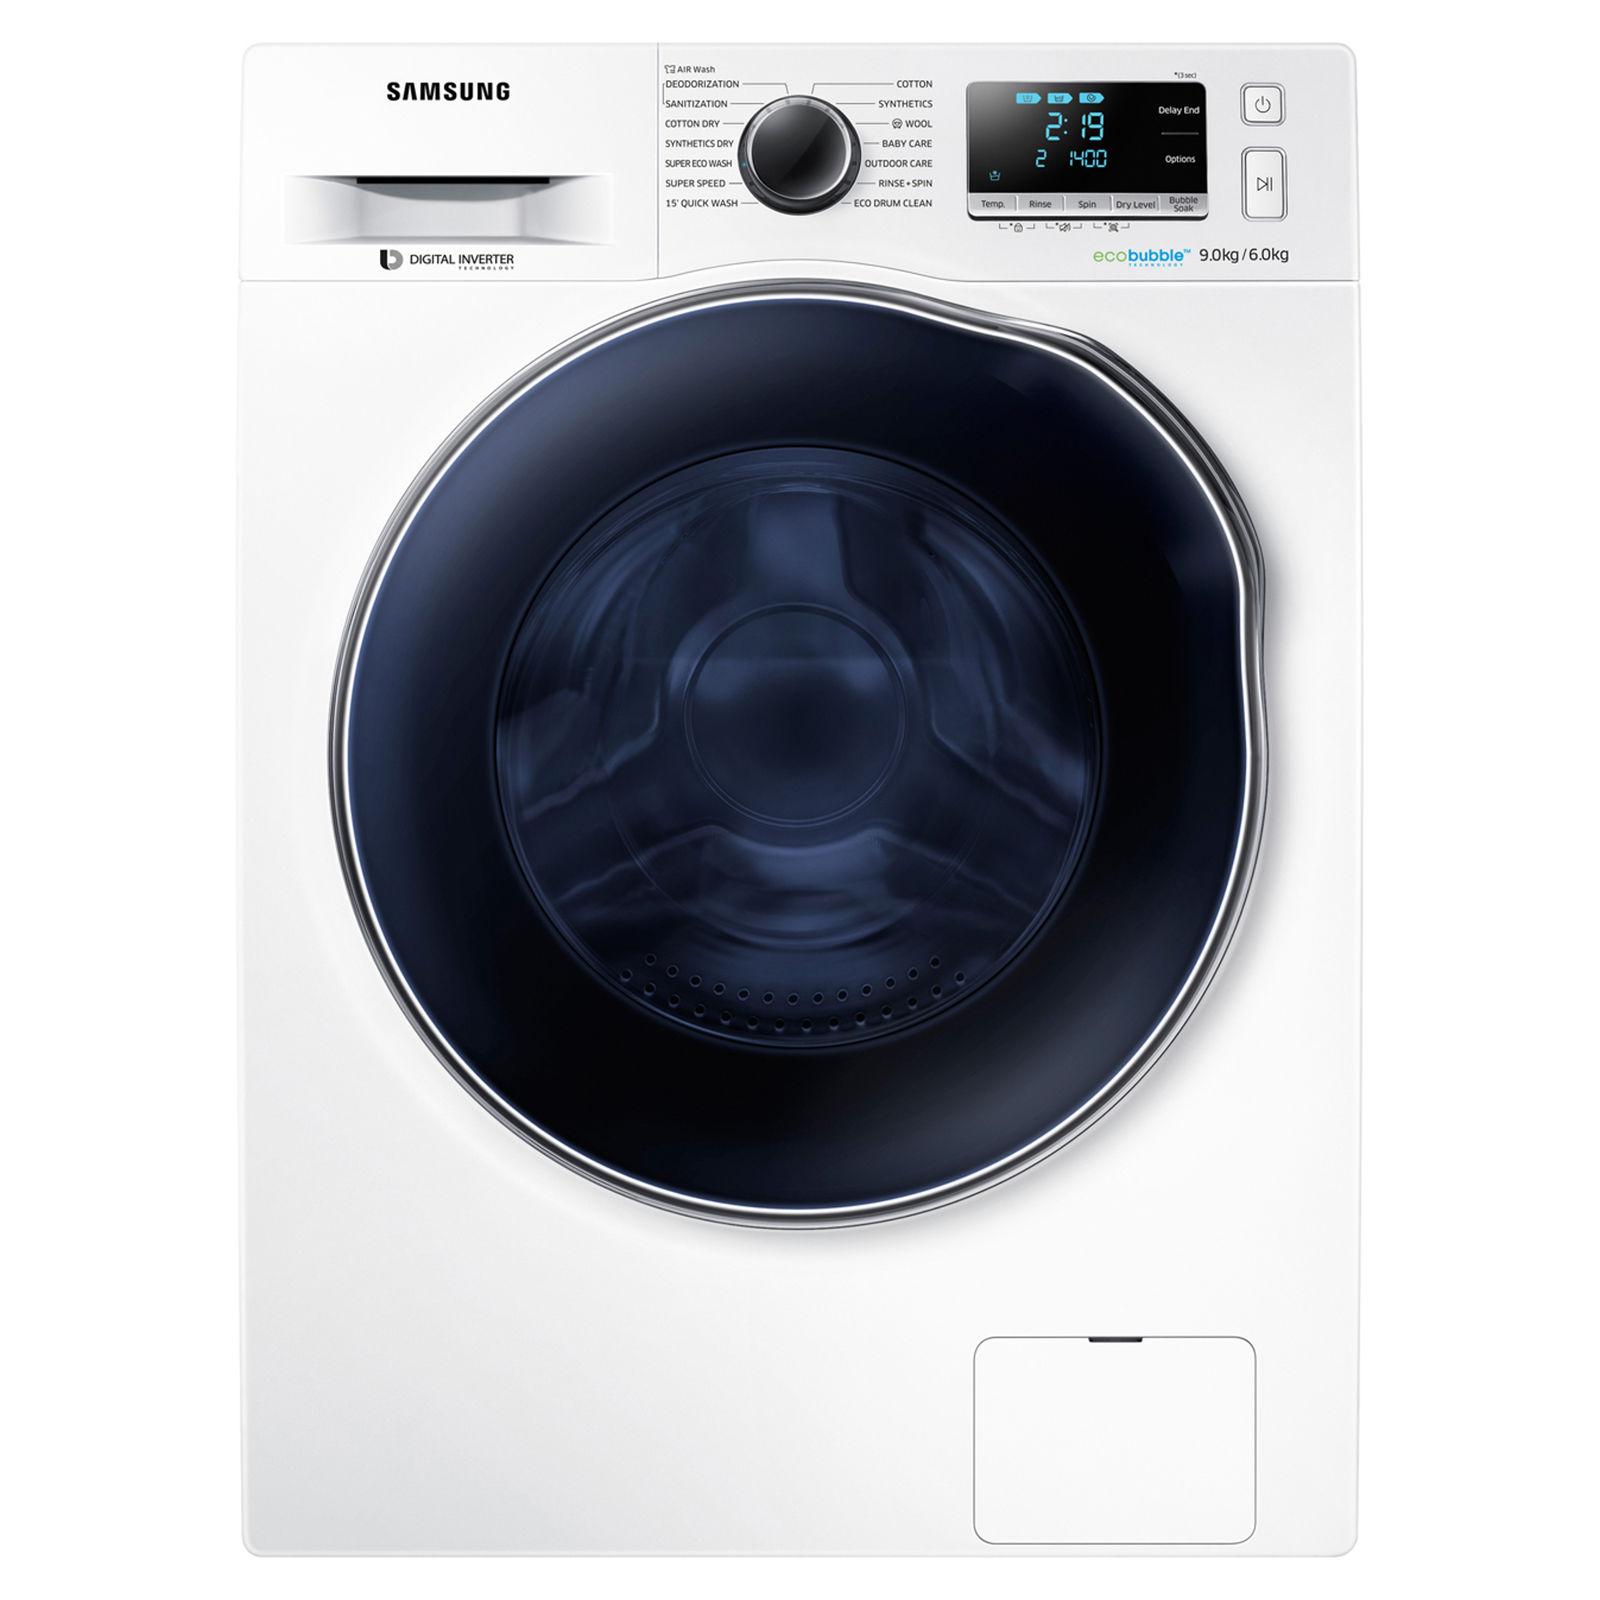 Samsung WD90J6A10AW Washer Dryer 9kg/6kg, 1400 RPM £513 w/code @ Hughes ebay